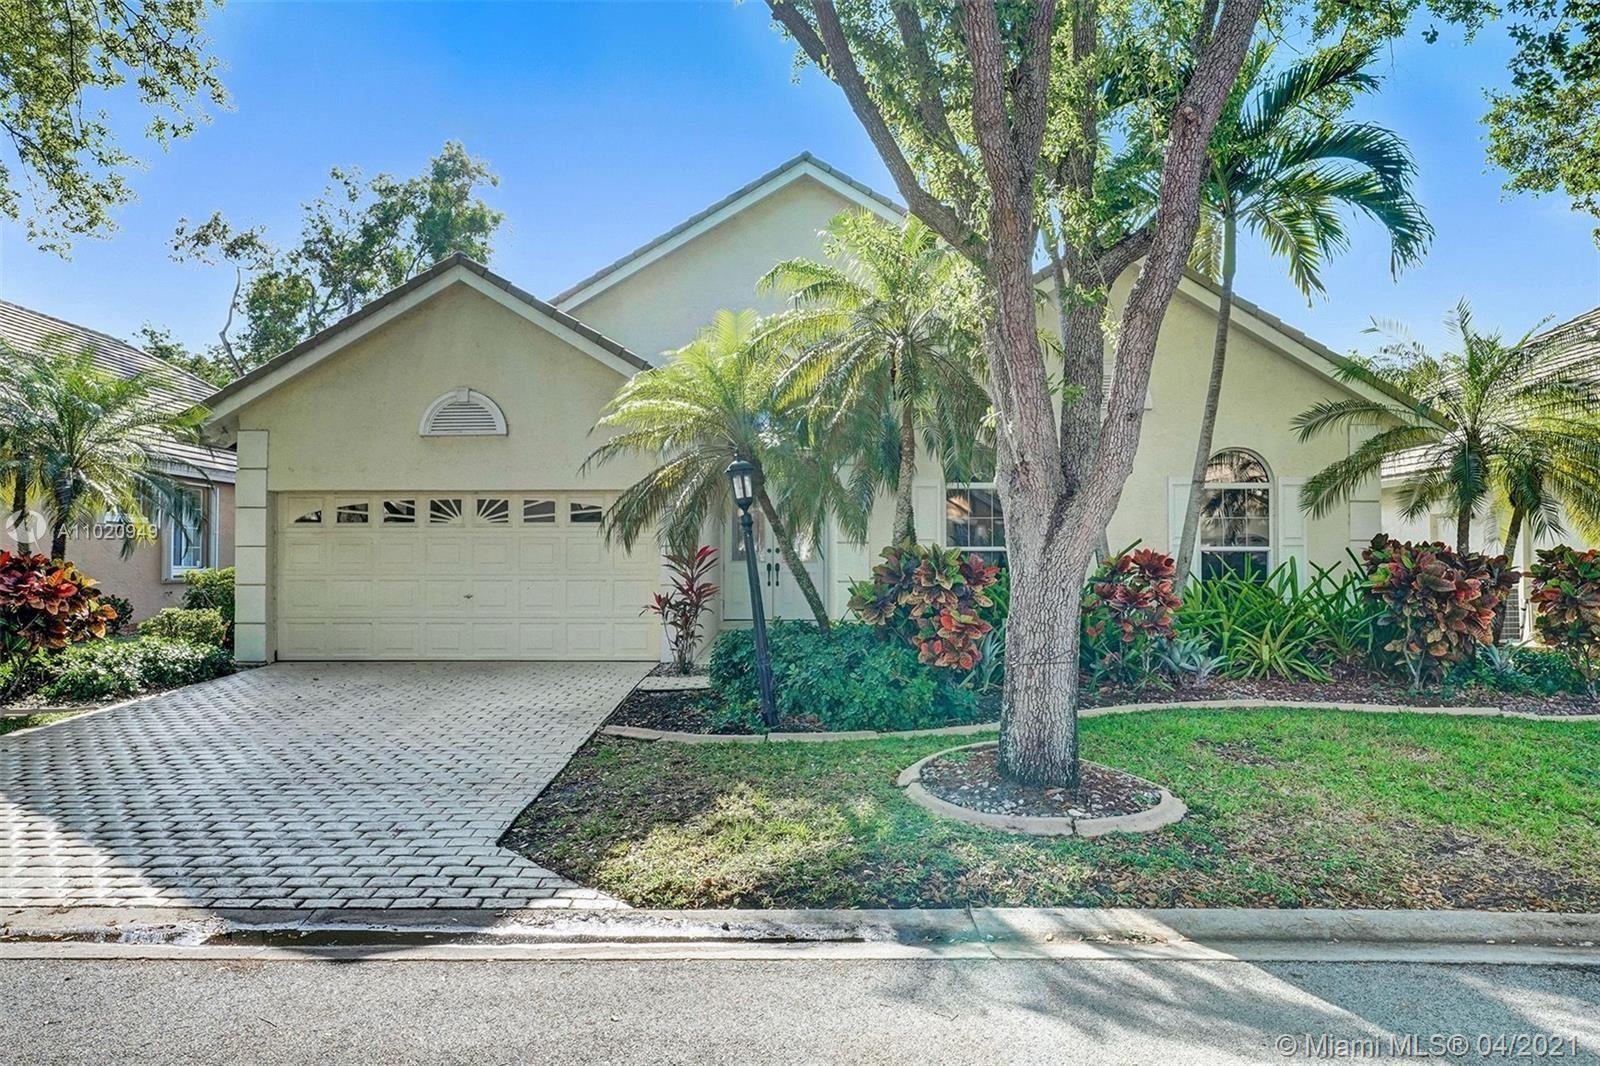 12717 NW 19th Mnr, Coral Springs, FL 33071 - #: A11020949